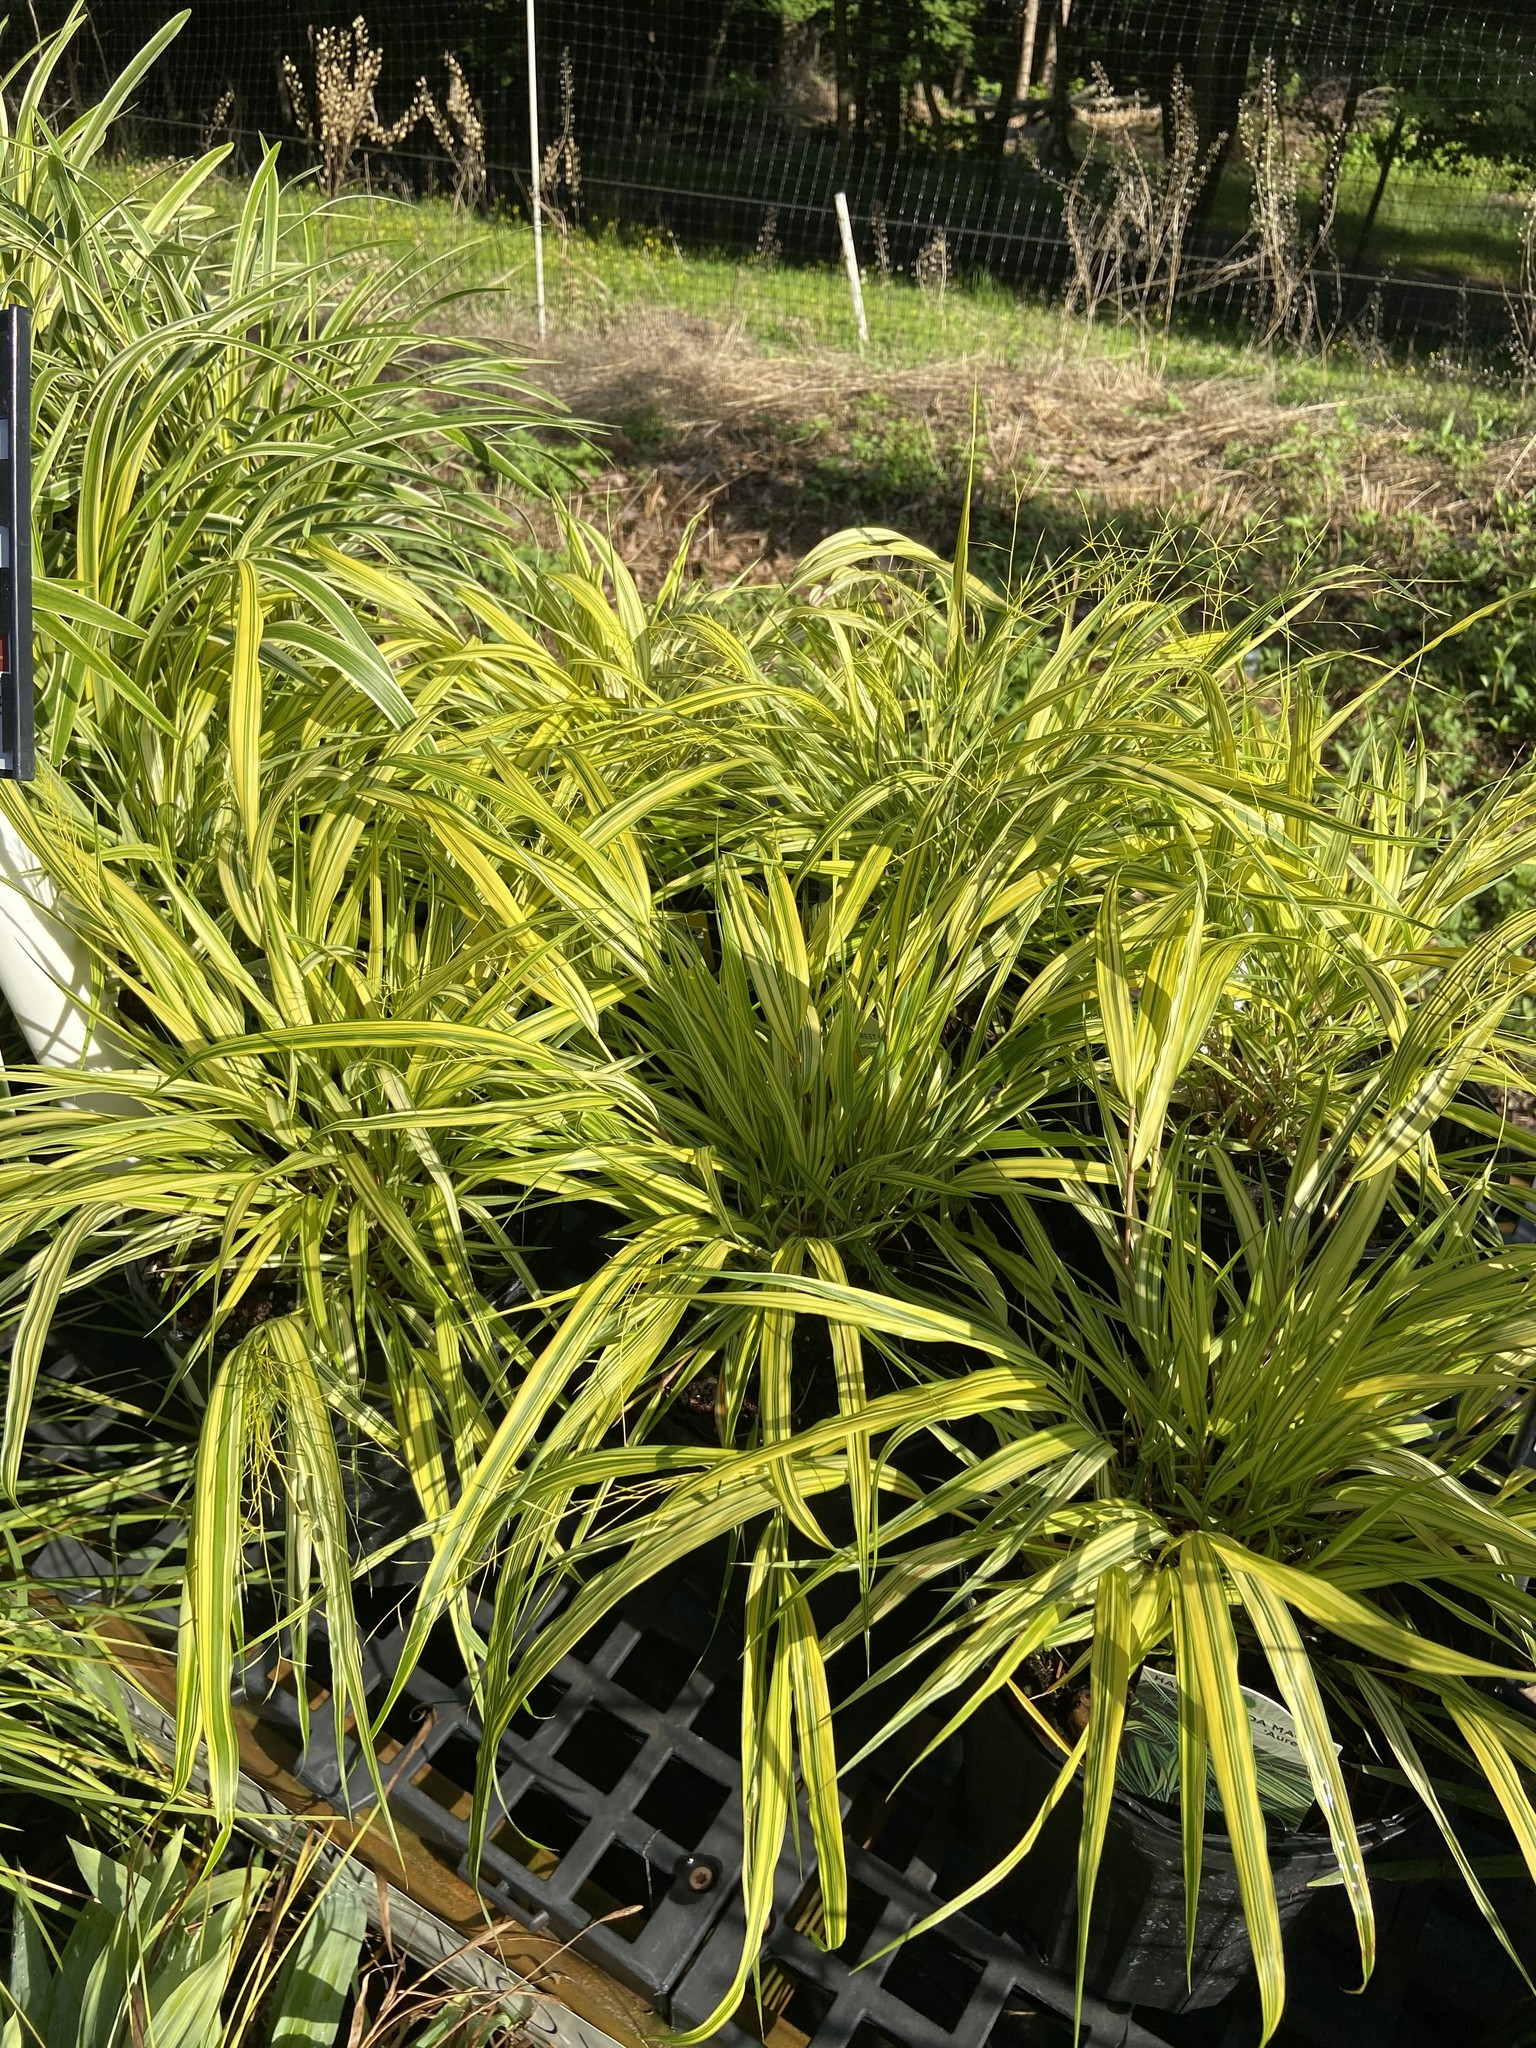 Hakonechloa mac. Aureola Grass - Ornamental Hakone, Aureola, #1